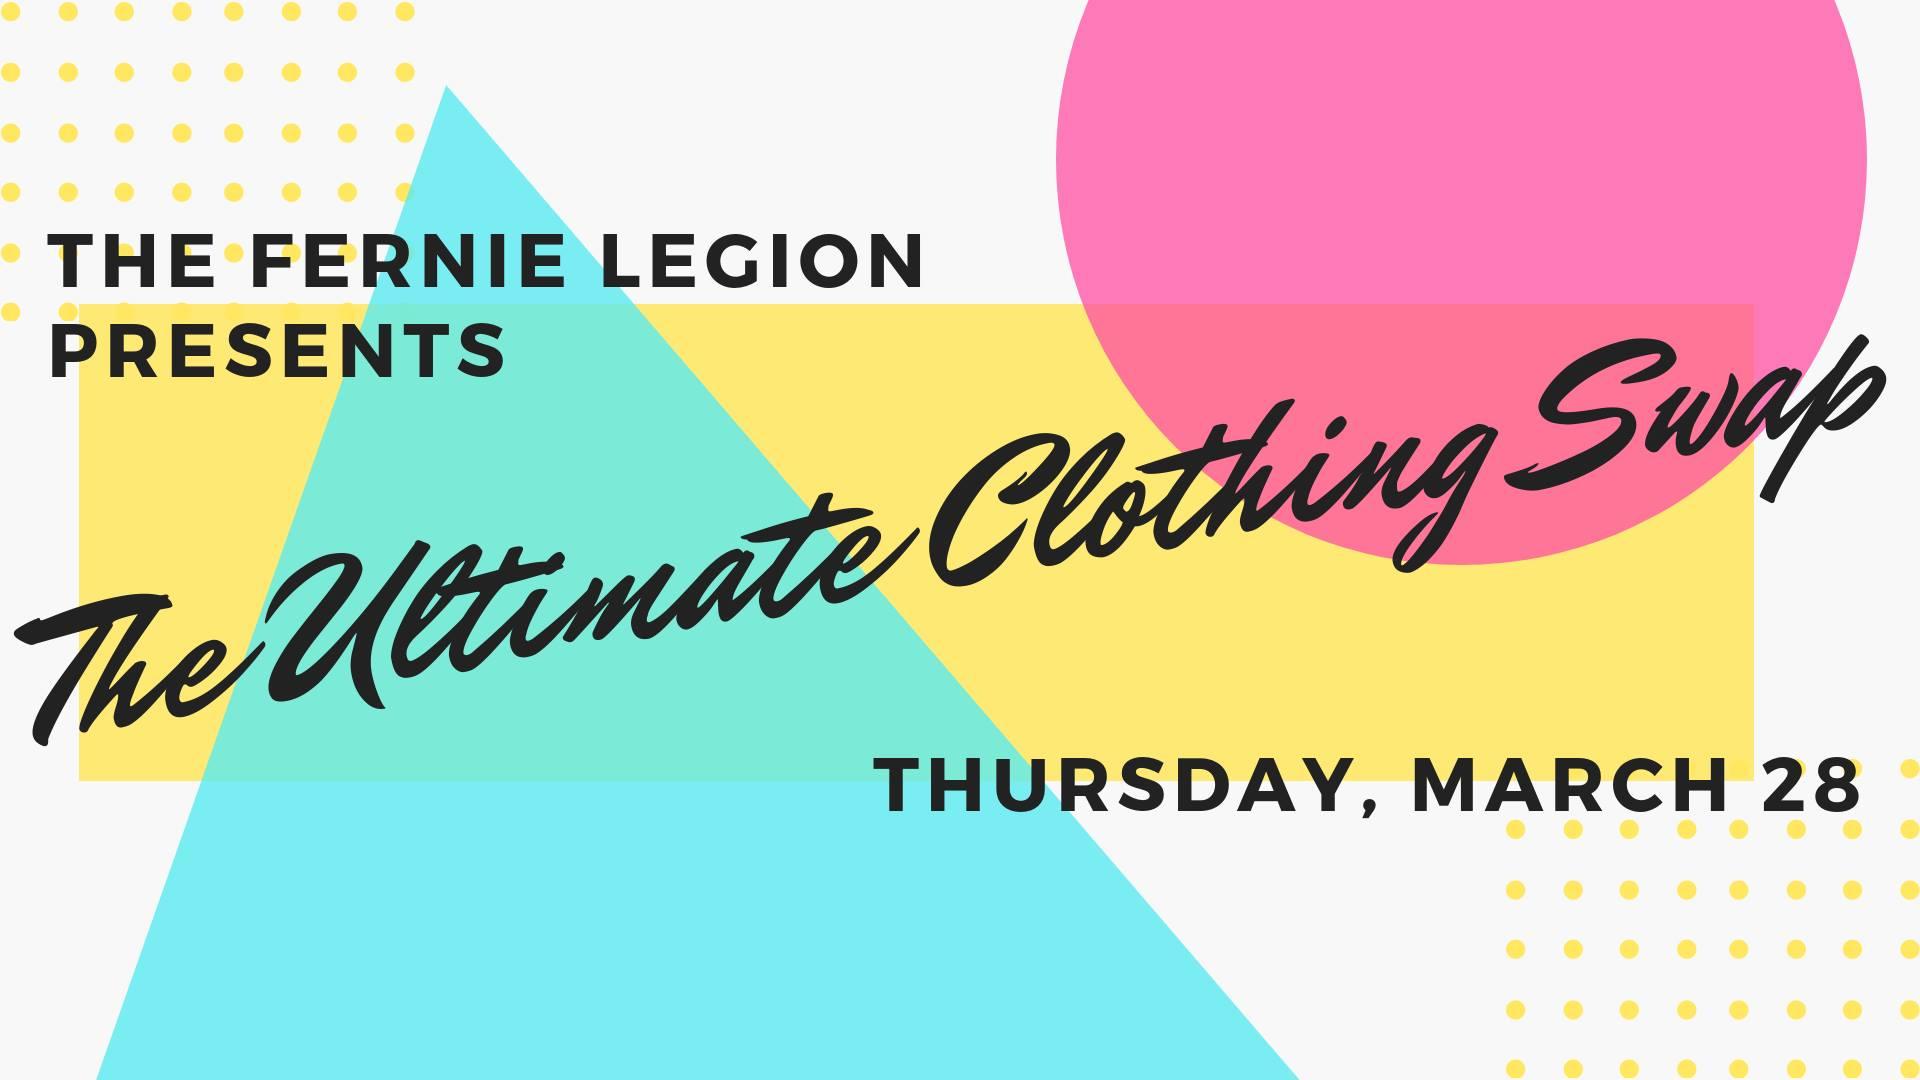 The Ultimate Clothing Swap | Fernie Fix Lifestyle Magazine